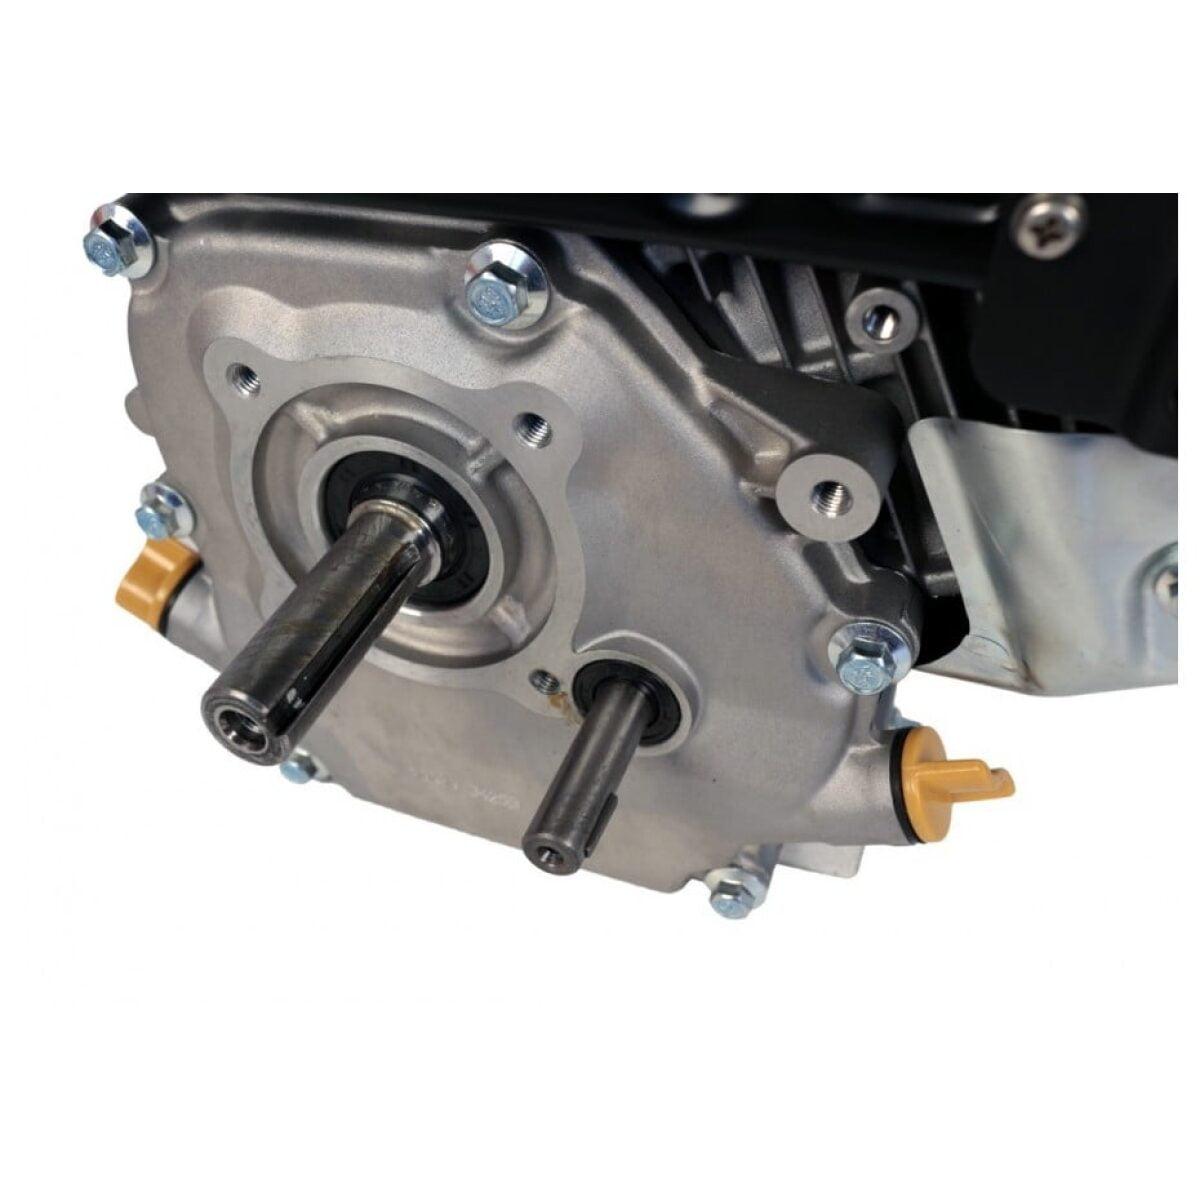 motor loncin lc600 lc170f d r padure gardina.ro 82